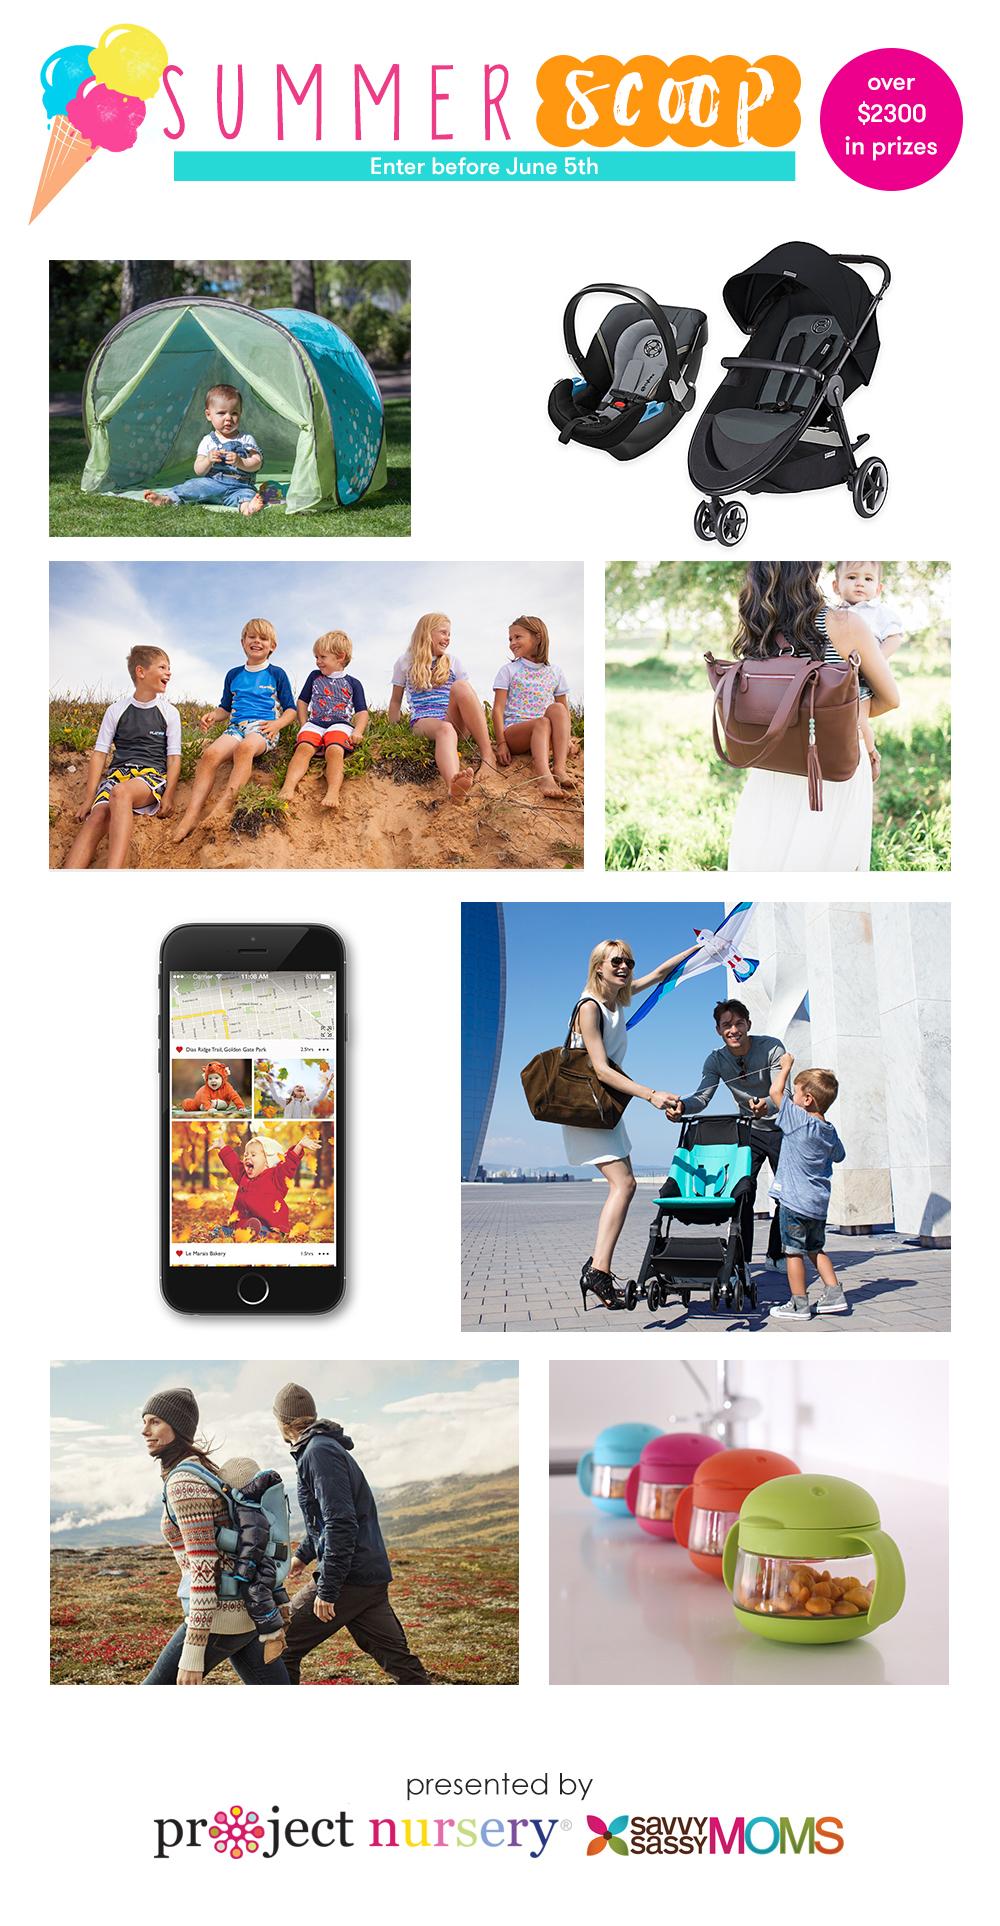 ee664903e657 Get the summer scoop with  SummerScoop4Moms  Giveaway  - Savvy Sassy ...